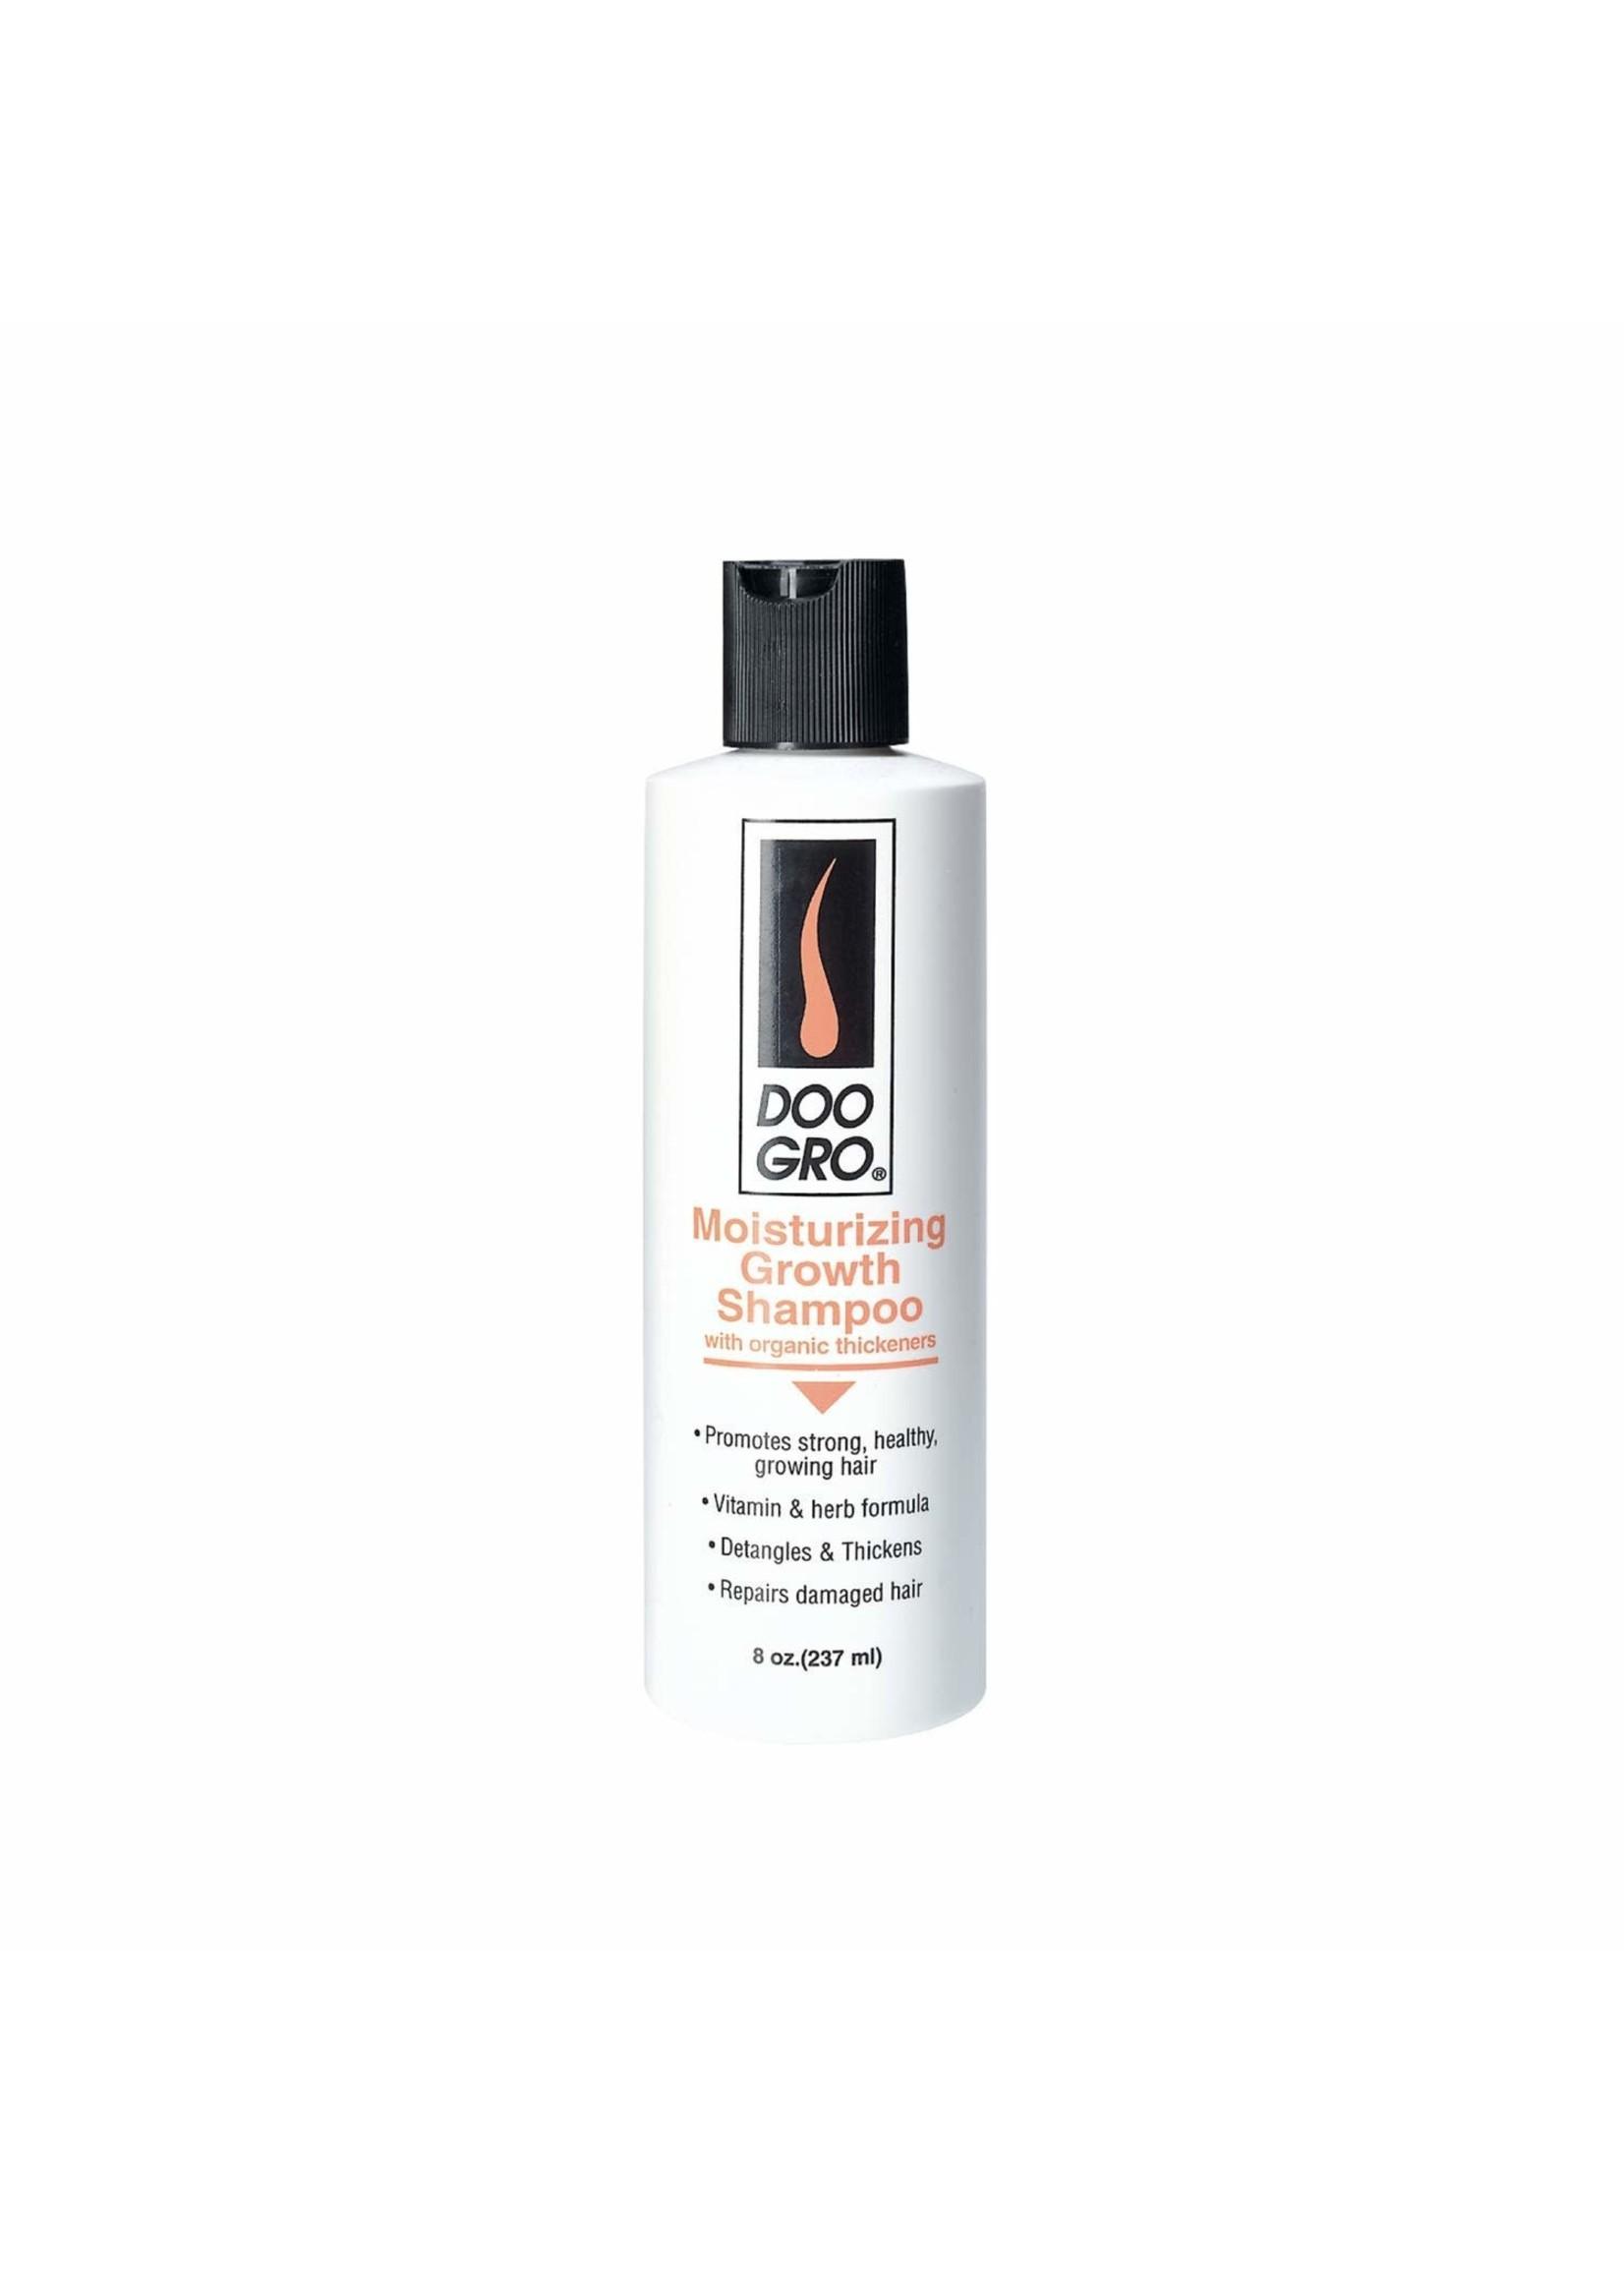 Doo Gro Growth Shampoo [Moisturizing]